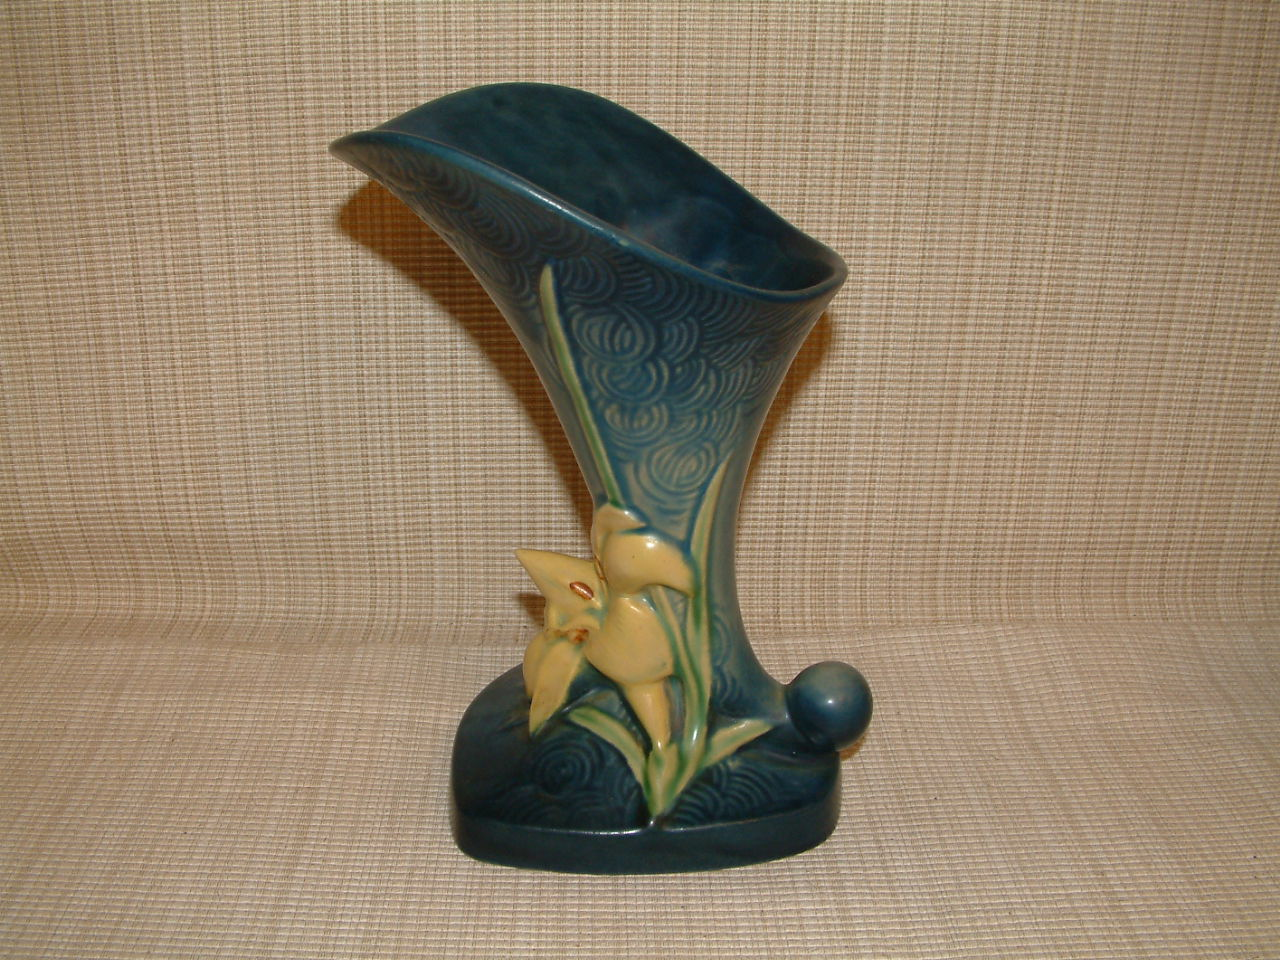 Roseville Zephyr Lily Cornucopia 8″ Vase  SOLD